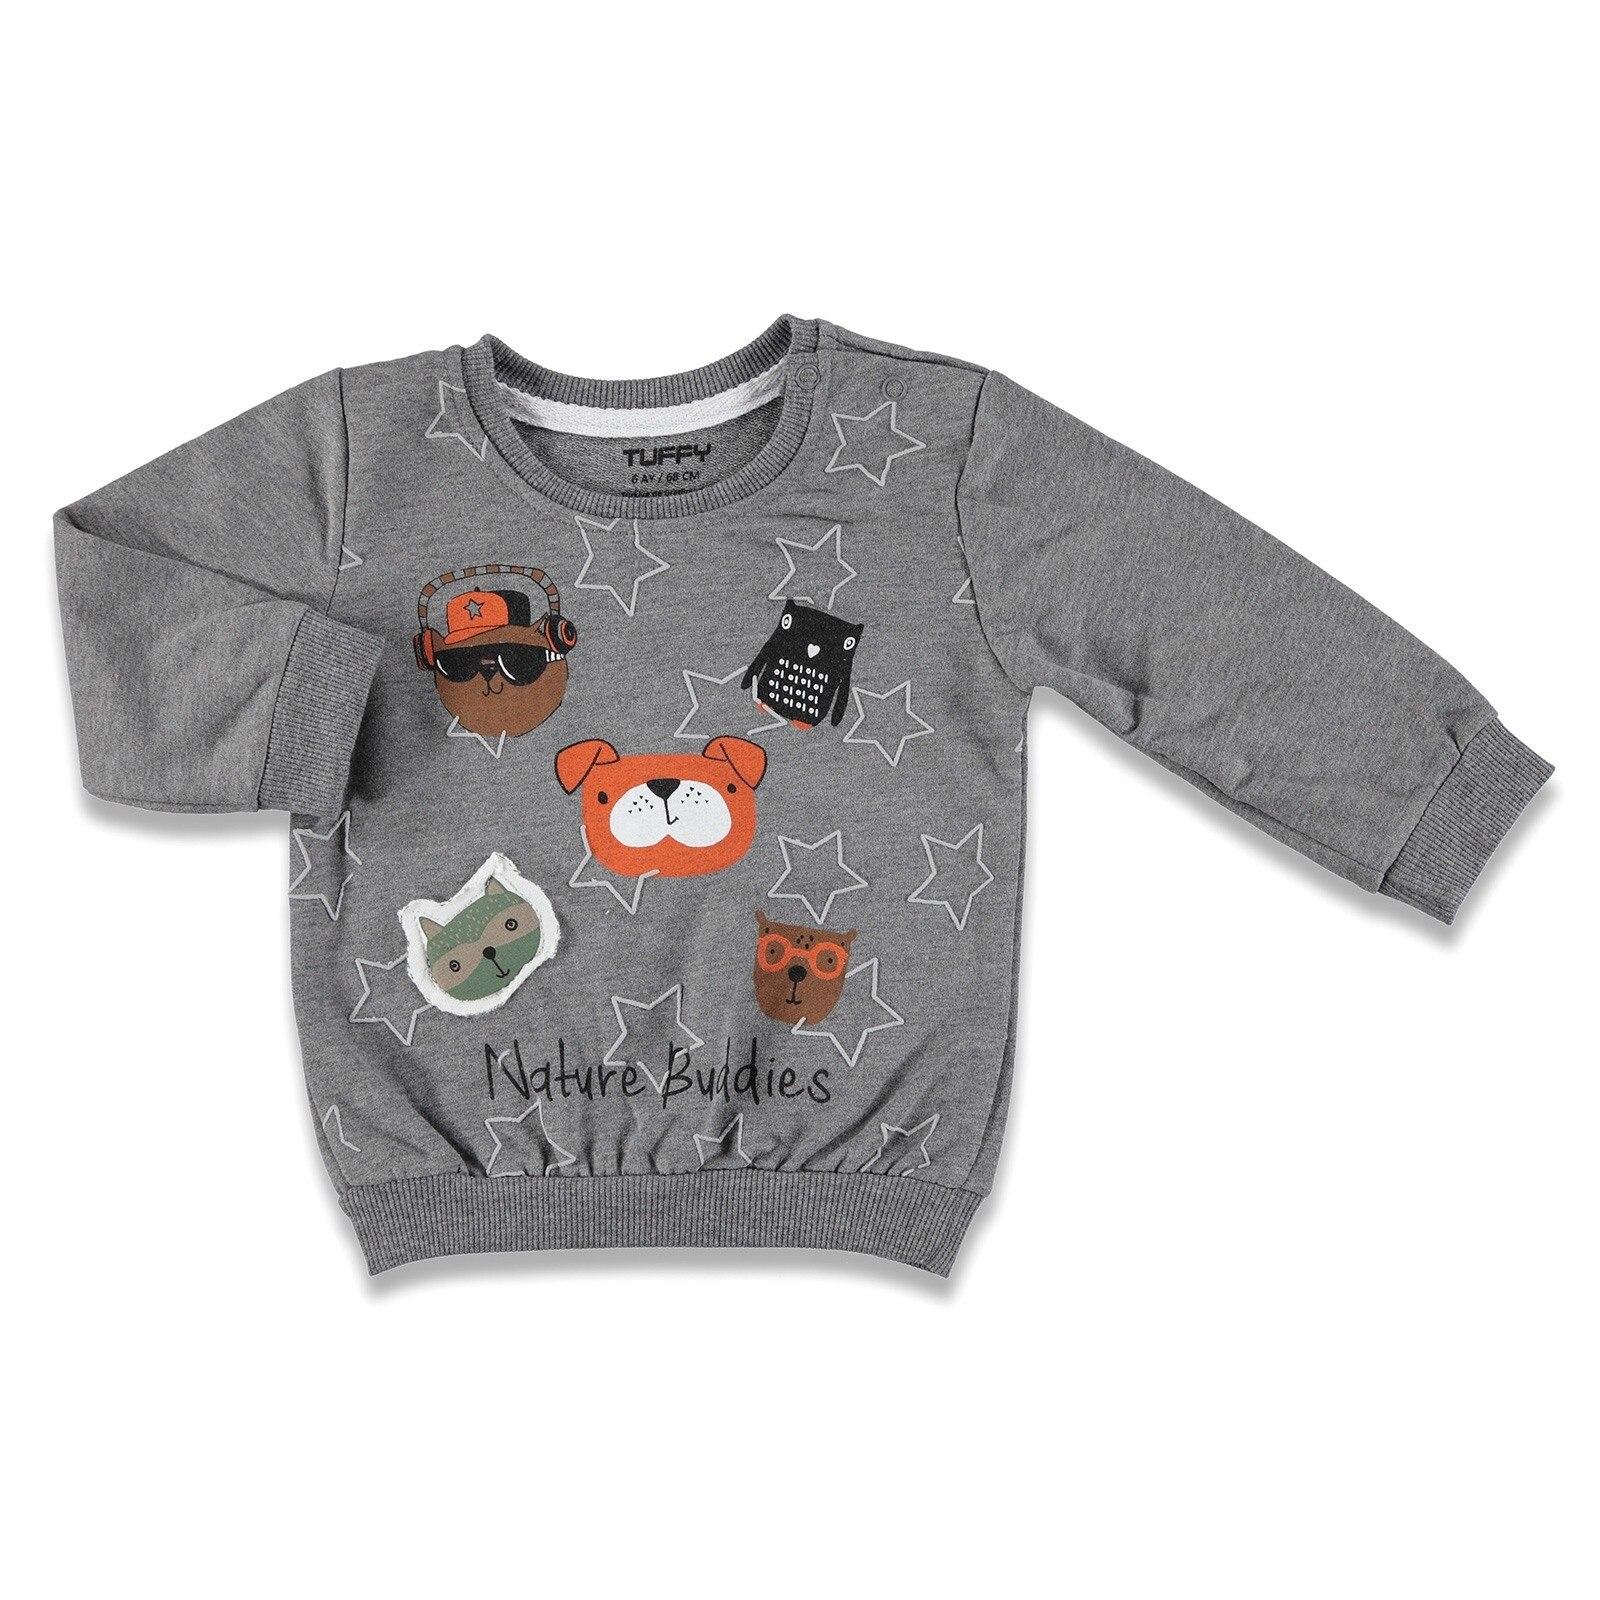 Ebebek Tuffy Fun Animals Printed Baby Boy Sweatshirt